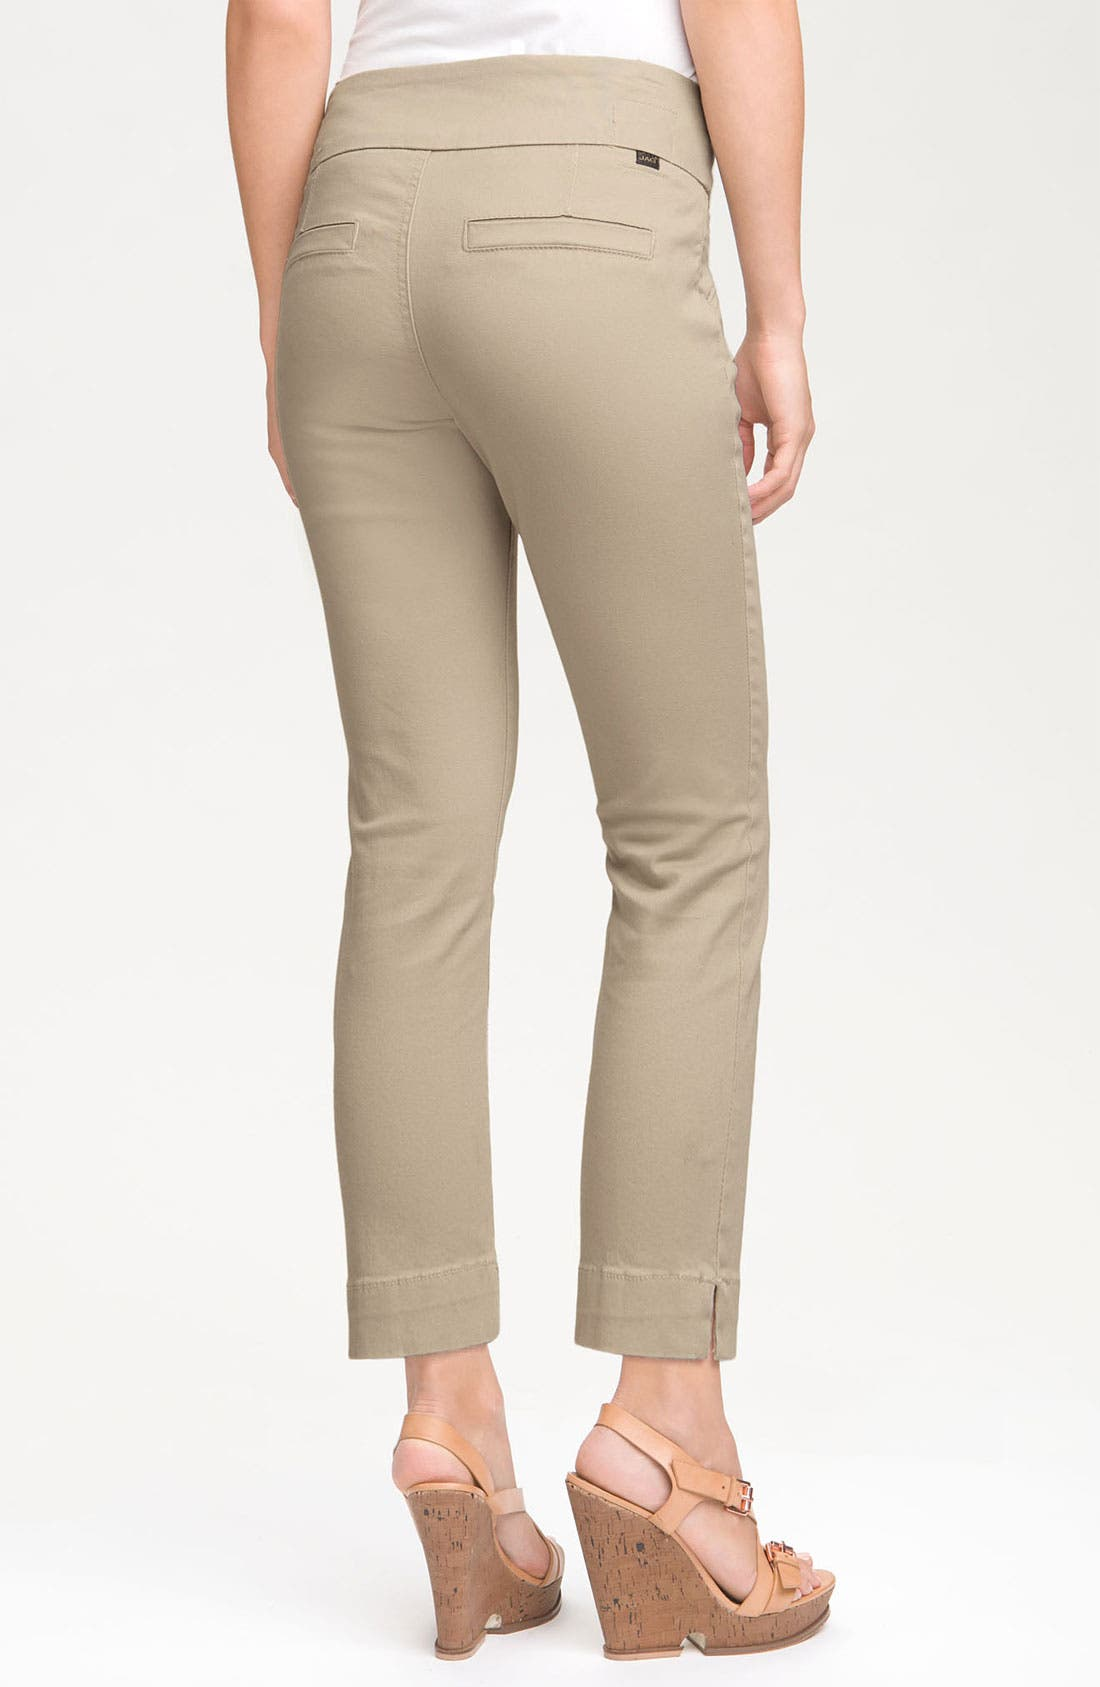 Alternate Image 2  - Jag Jeans 'Attie' Slim Ankle Jeans (Petite)